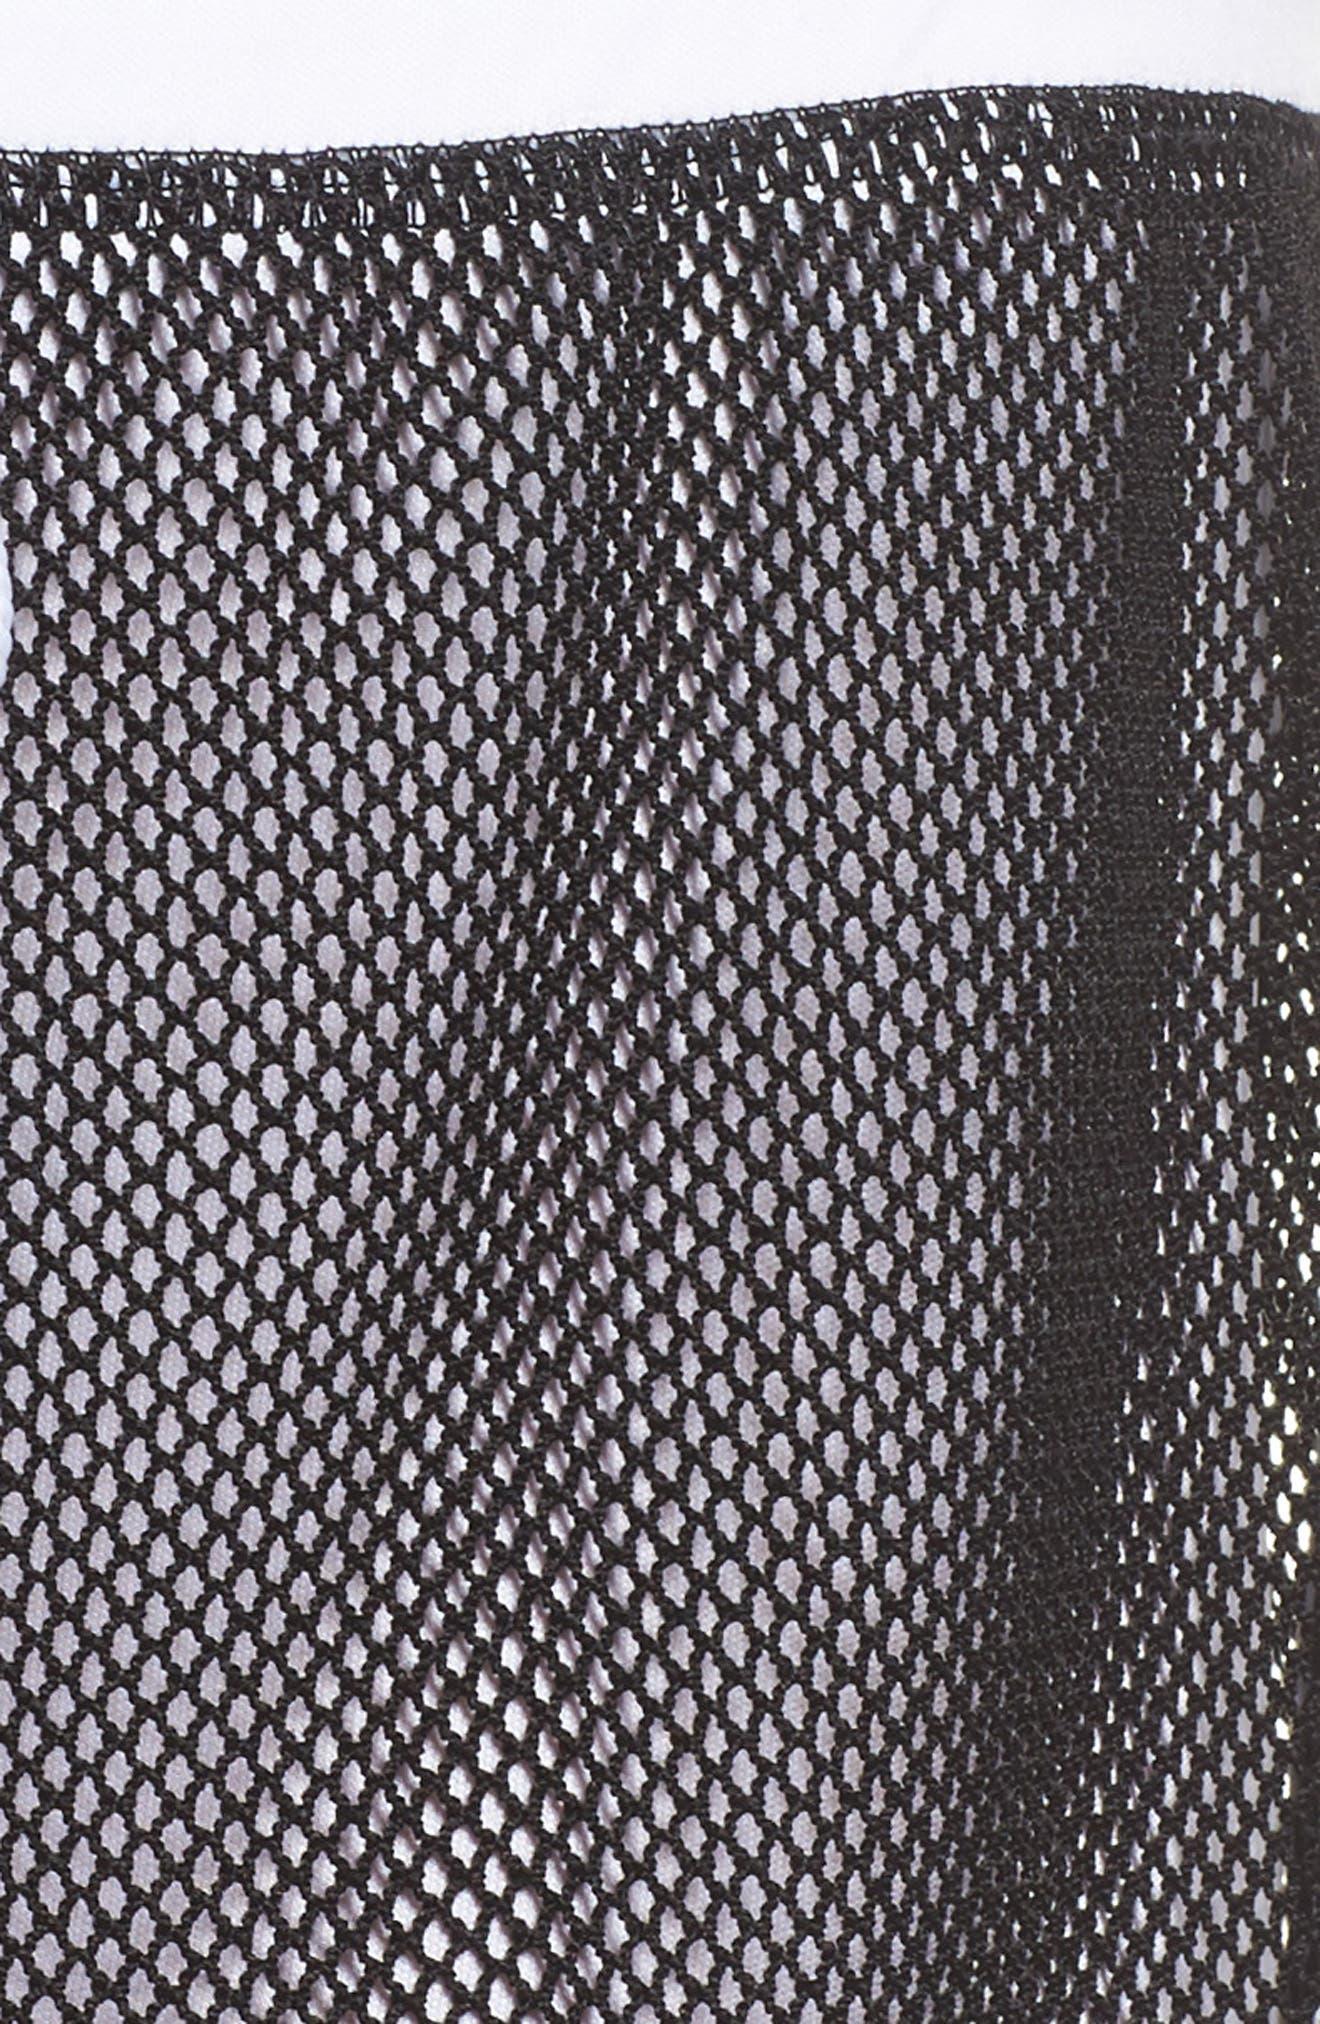 Mesh 2-in-1 Mesh Shorts,                             Alternate thumbnail 5, color,                             White